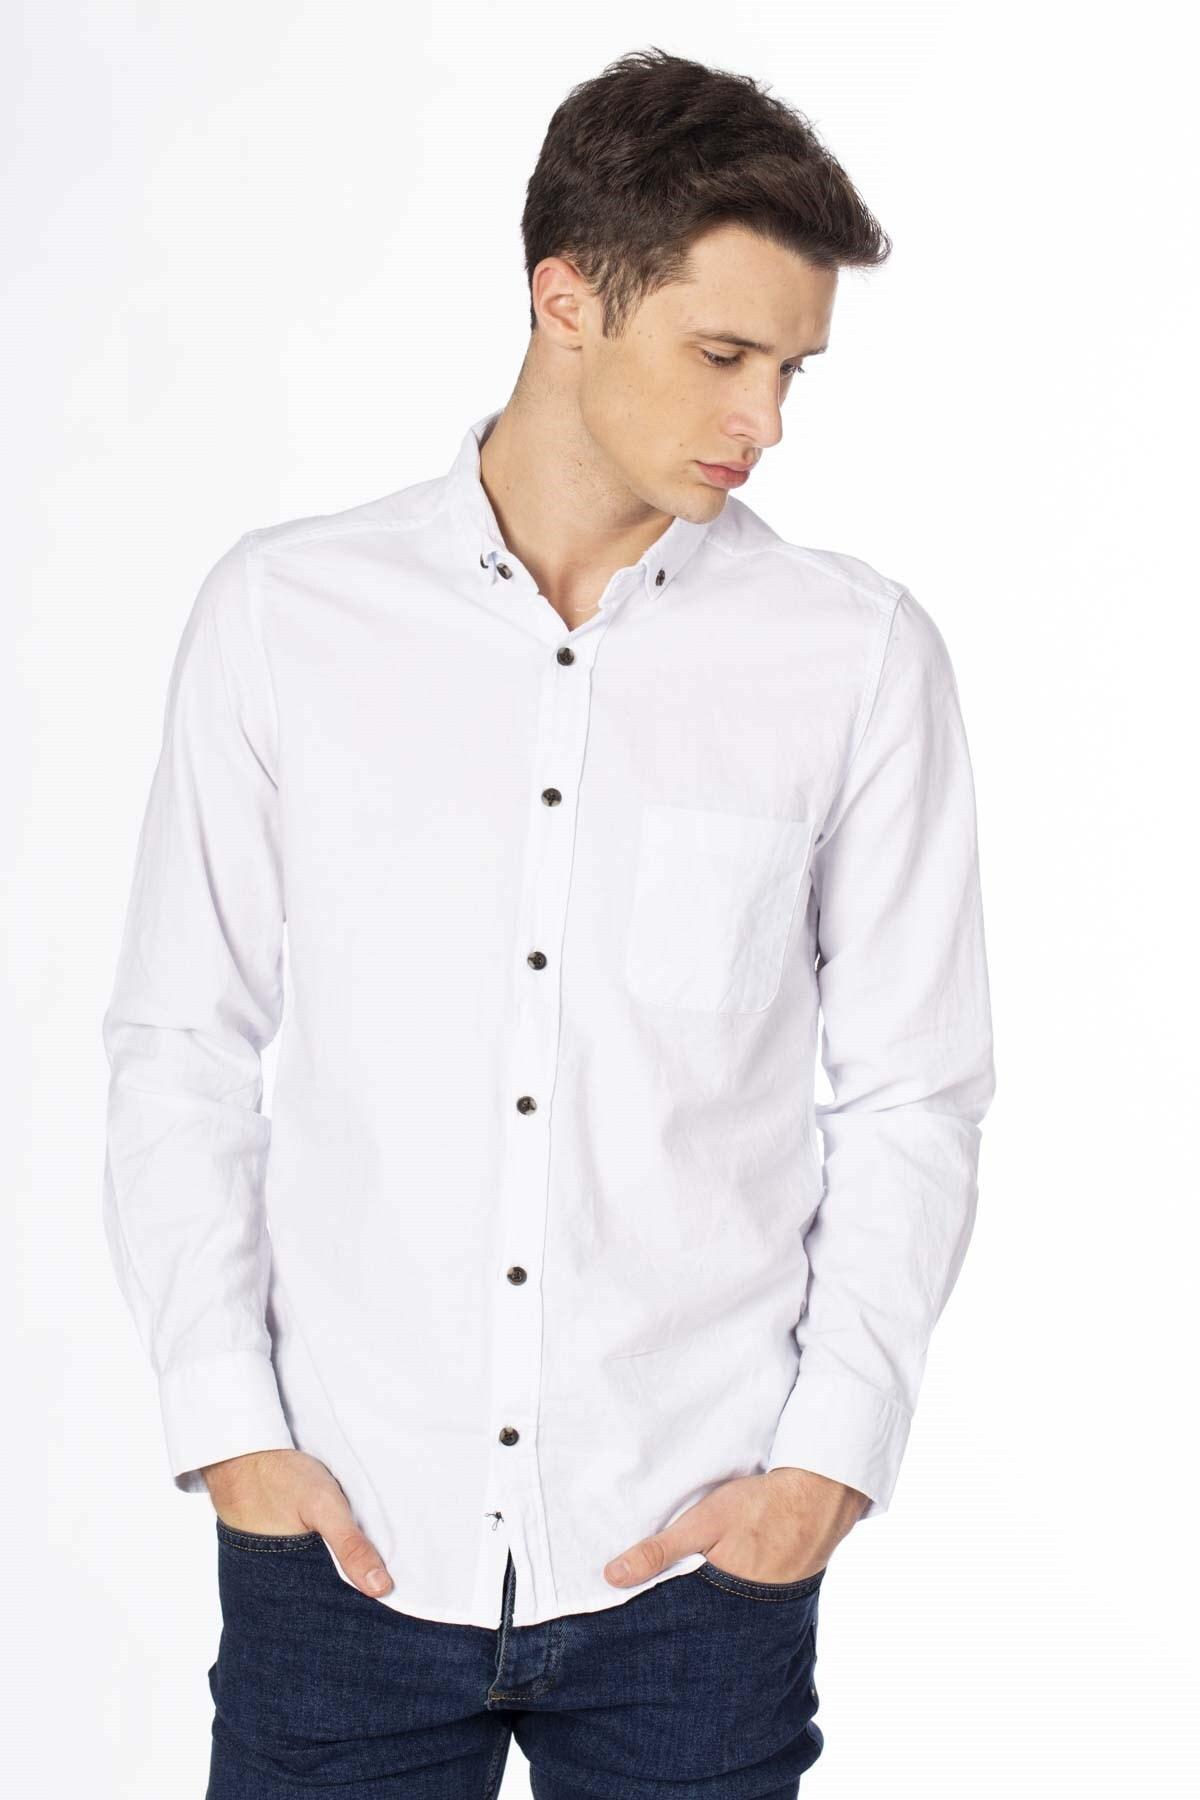 BARRELS AND OIL Erkek Beyaz Oxford Gömlek 344-20Y03031.55